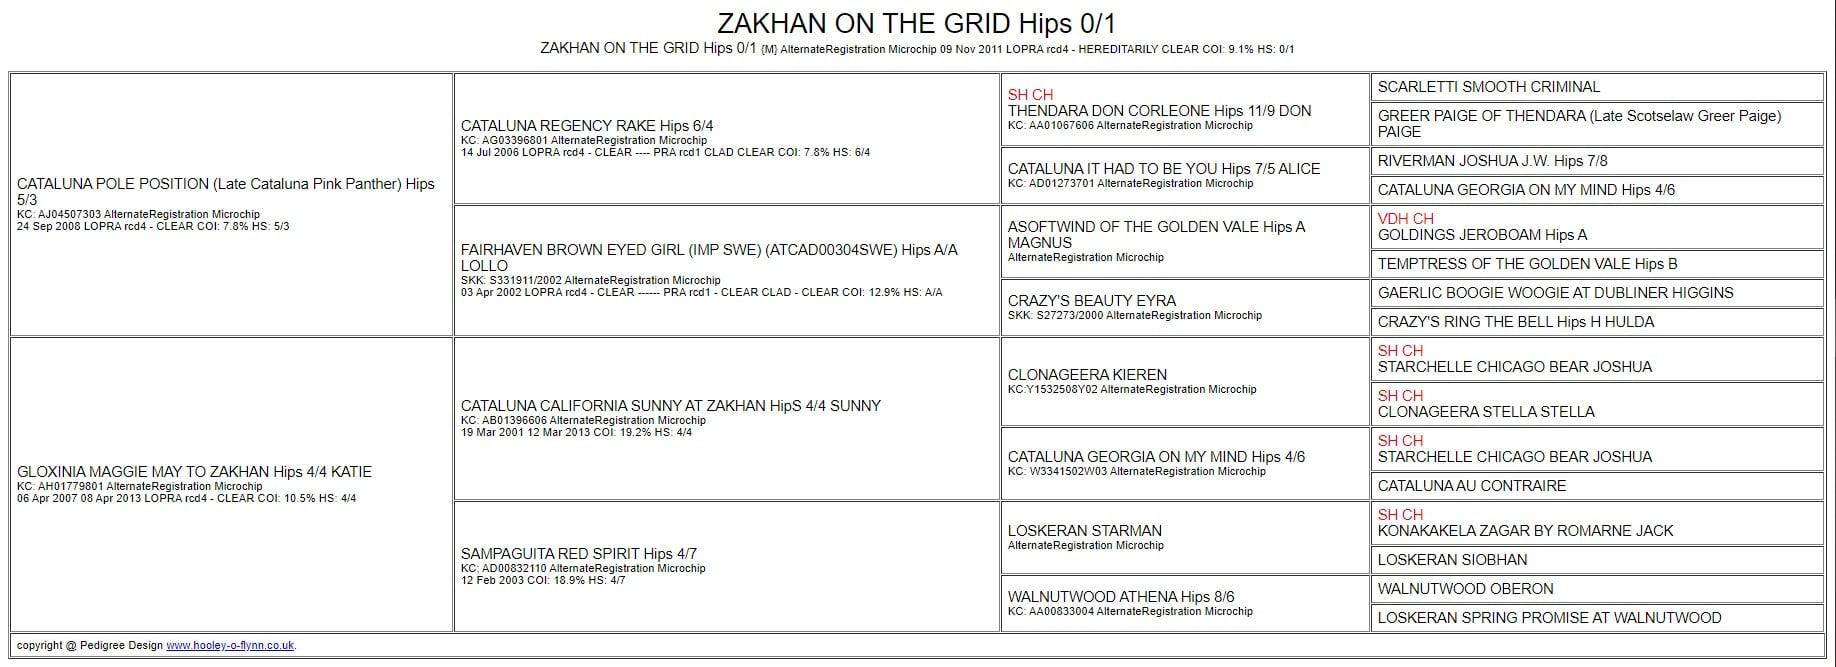 JENSEN - ZAKHAN ON THE GRID